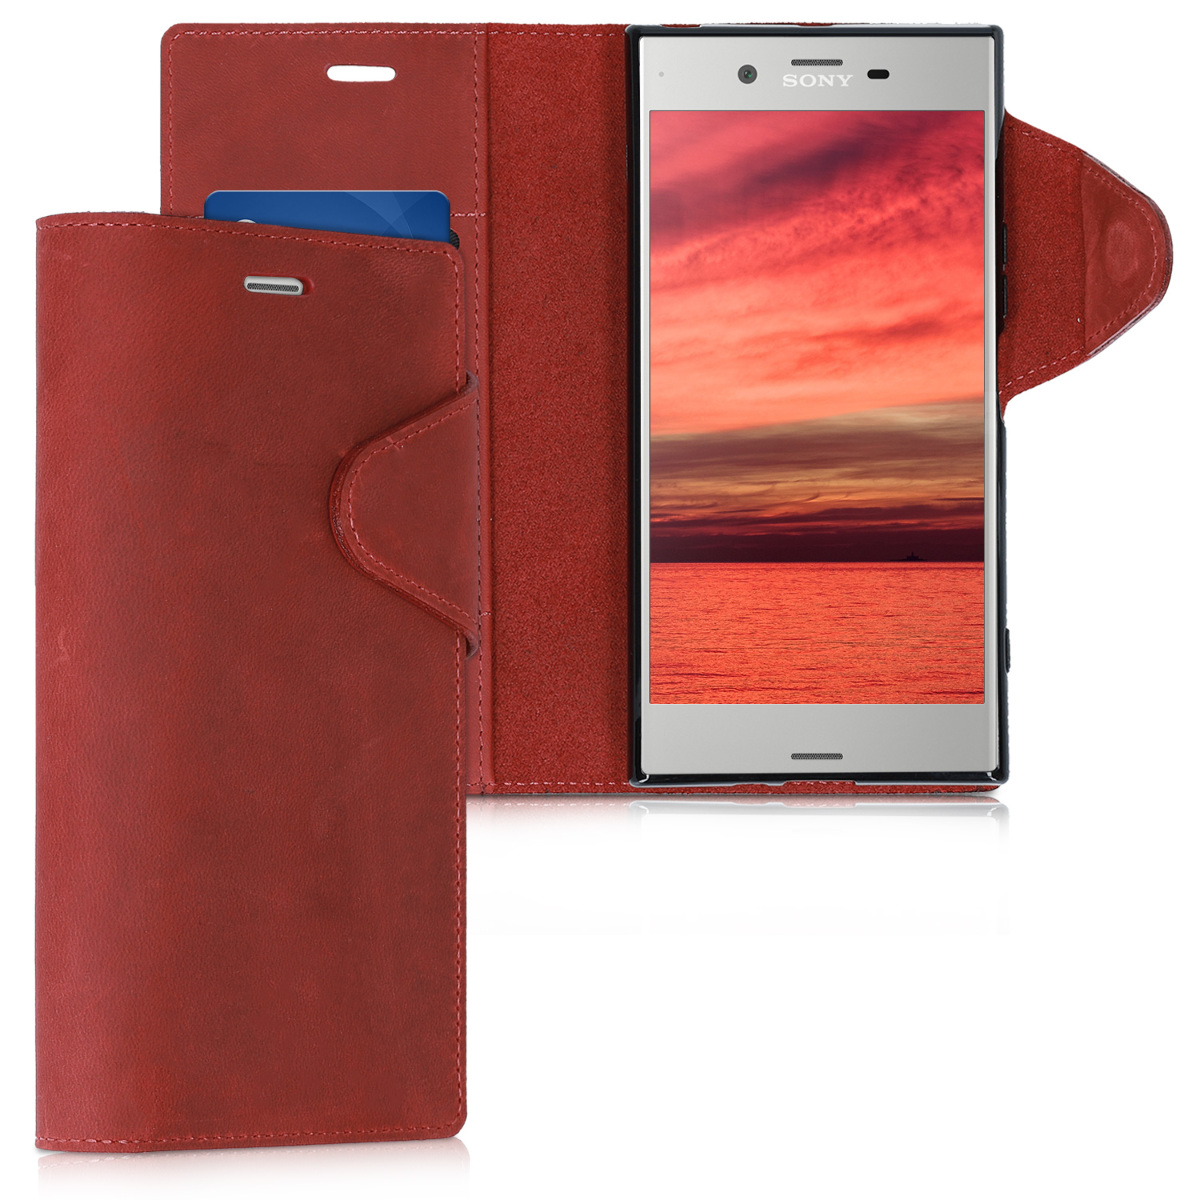 Kalibri Δερμάτινη Suede Θήκη - Πορτοφόλι Sony Xperia XZ Premium - Dark Red (42942.20)